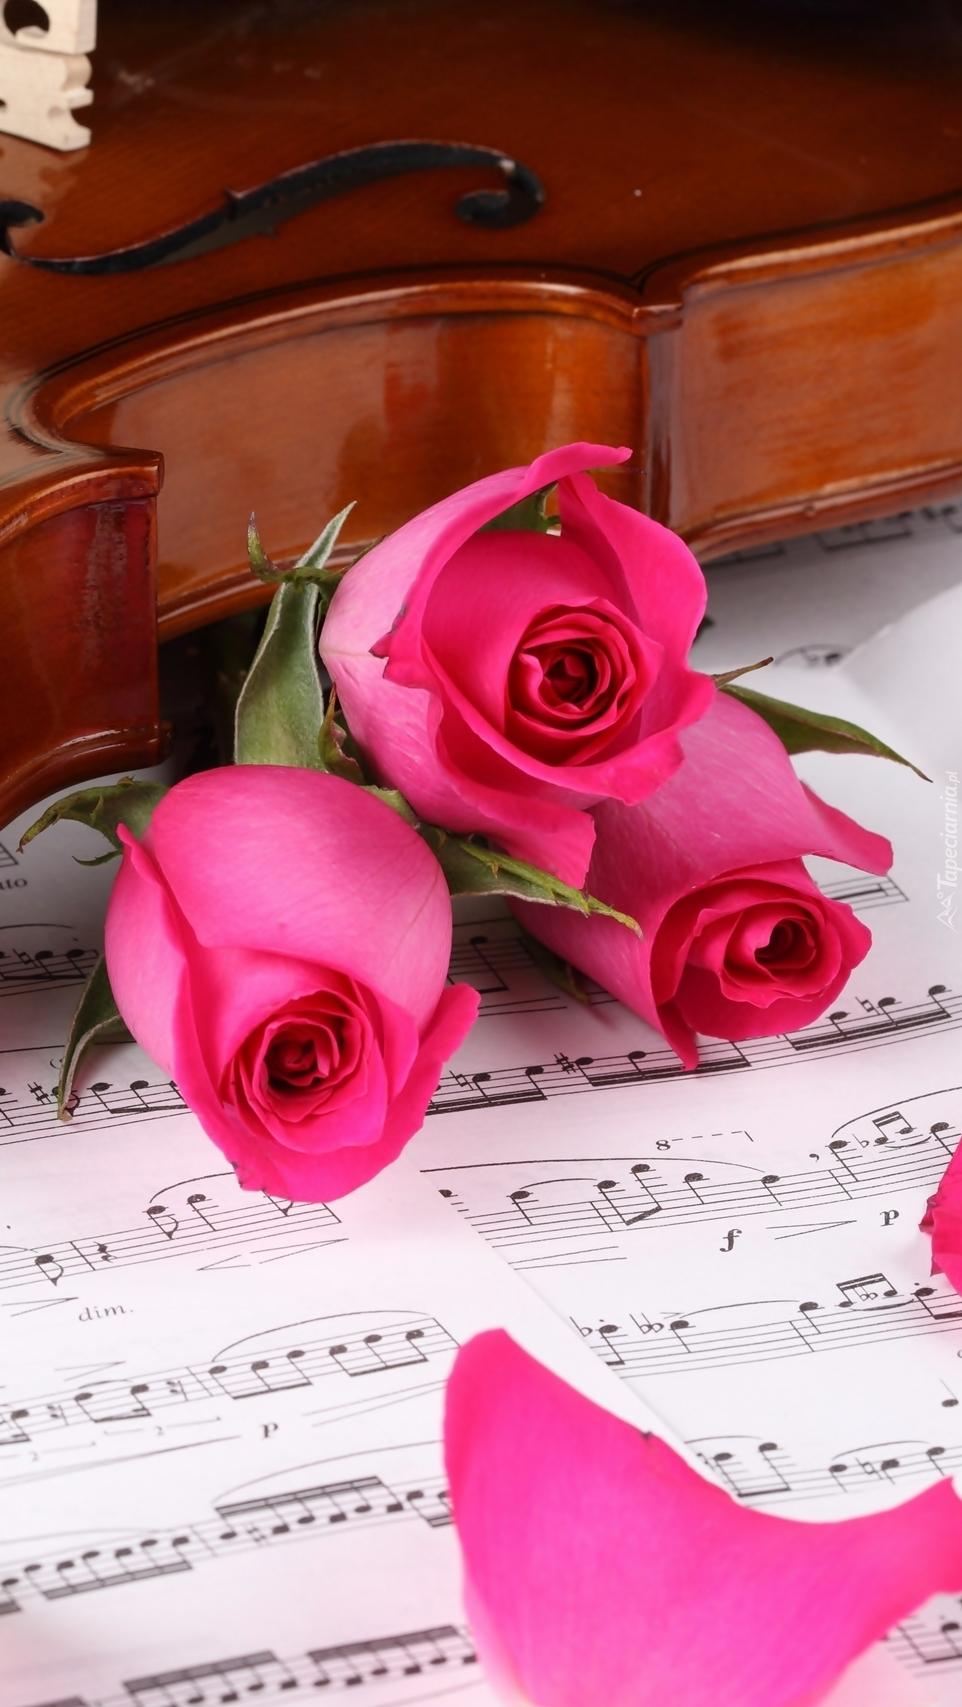 Skrzypce i róże na nutach